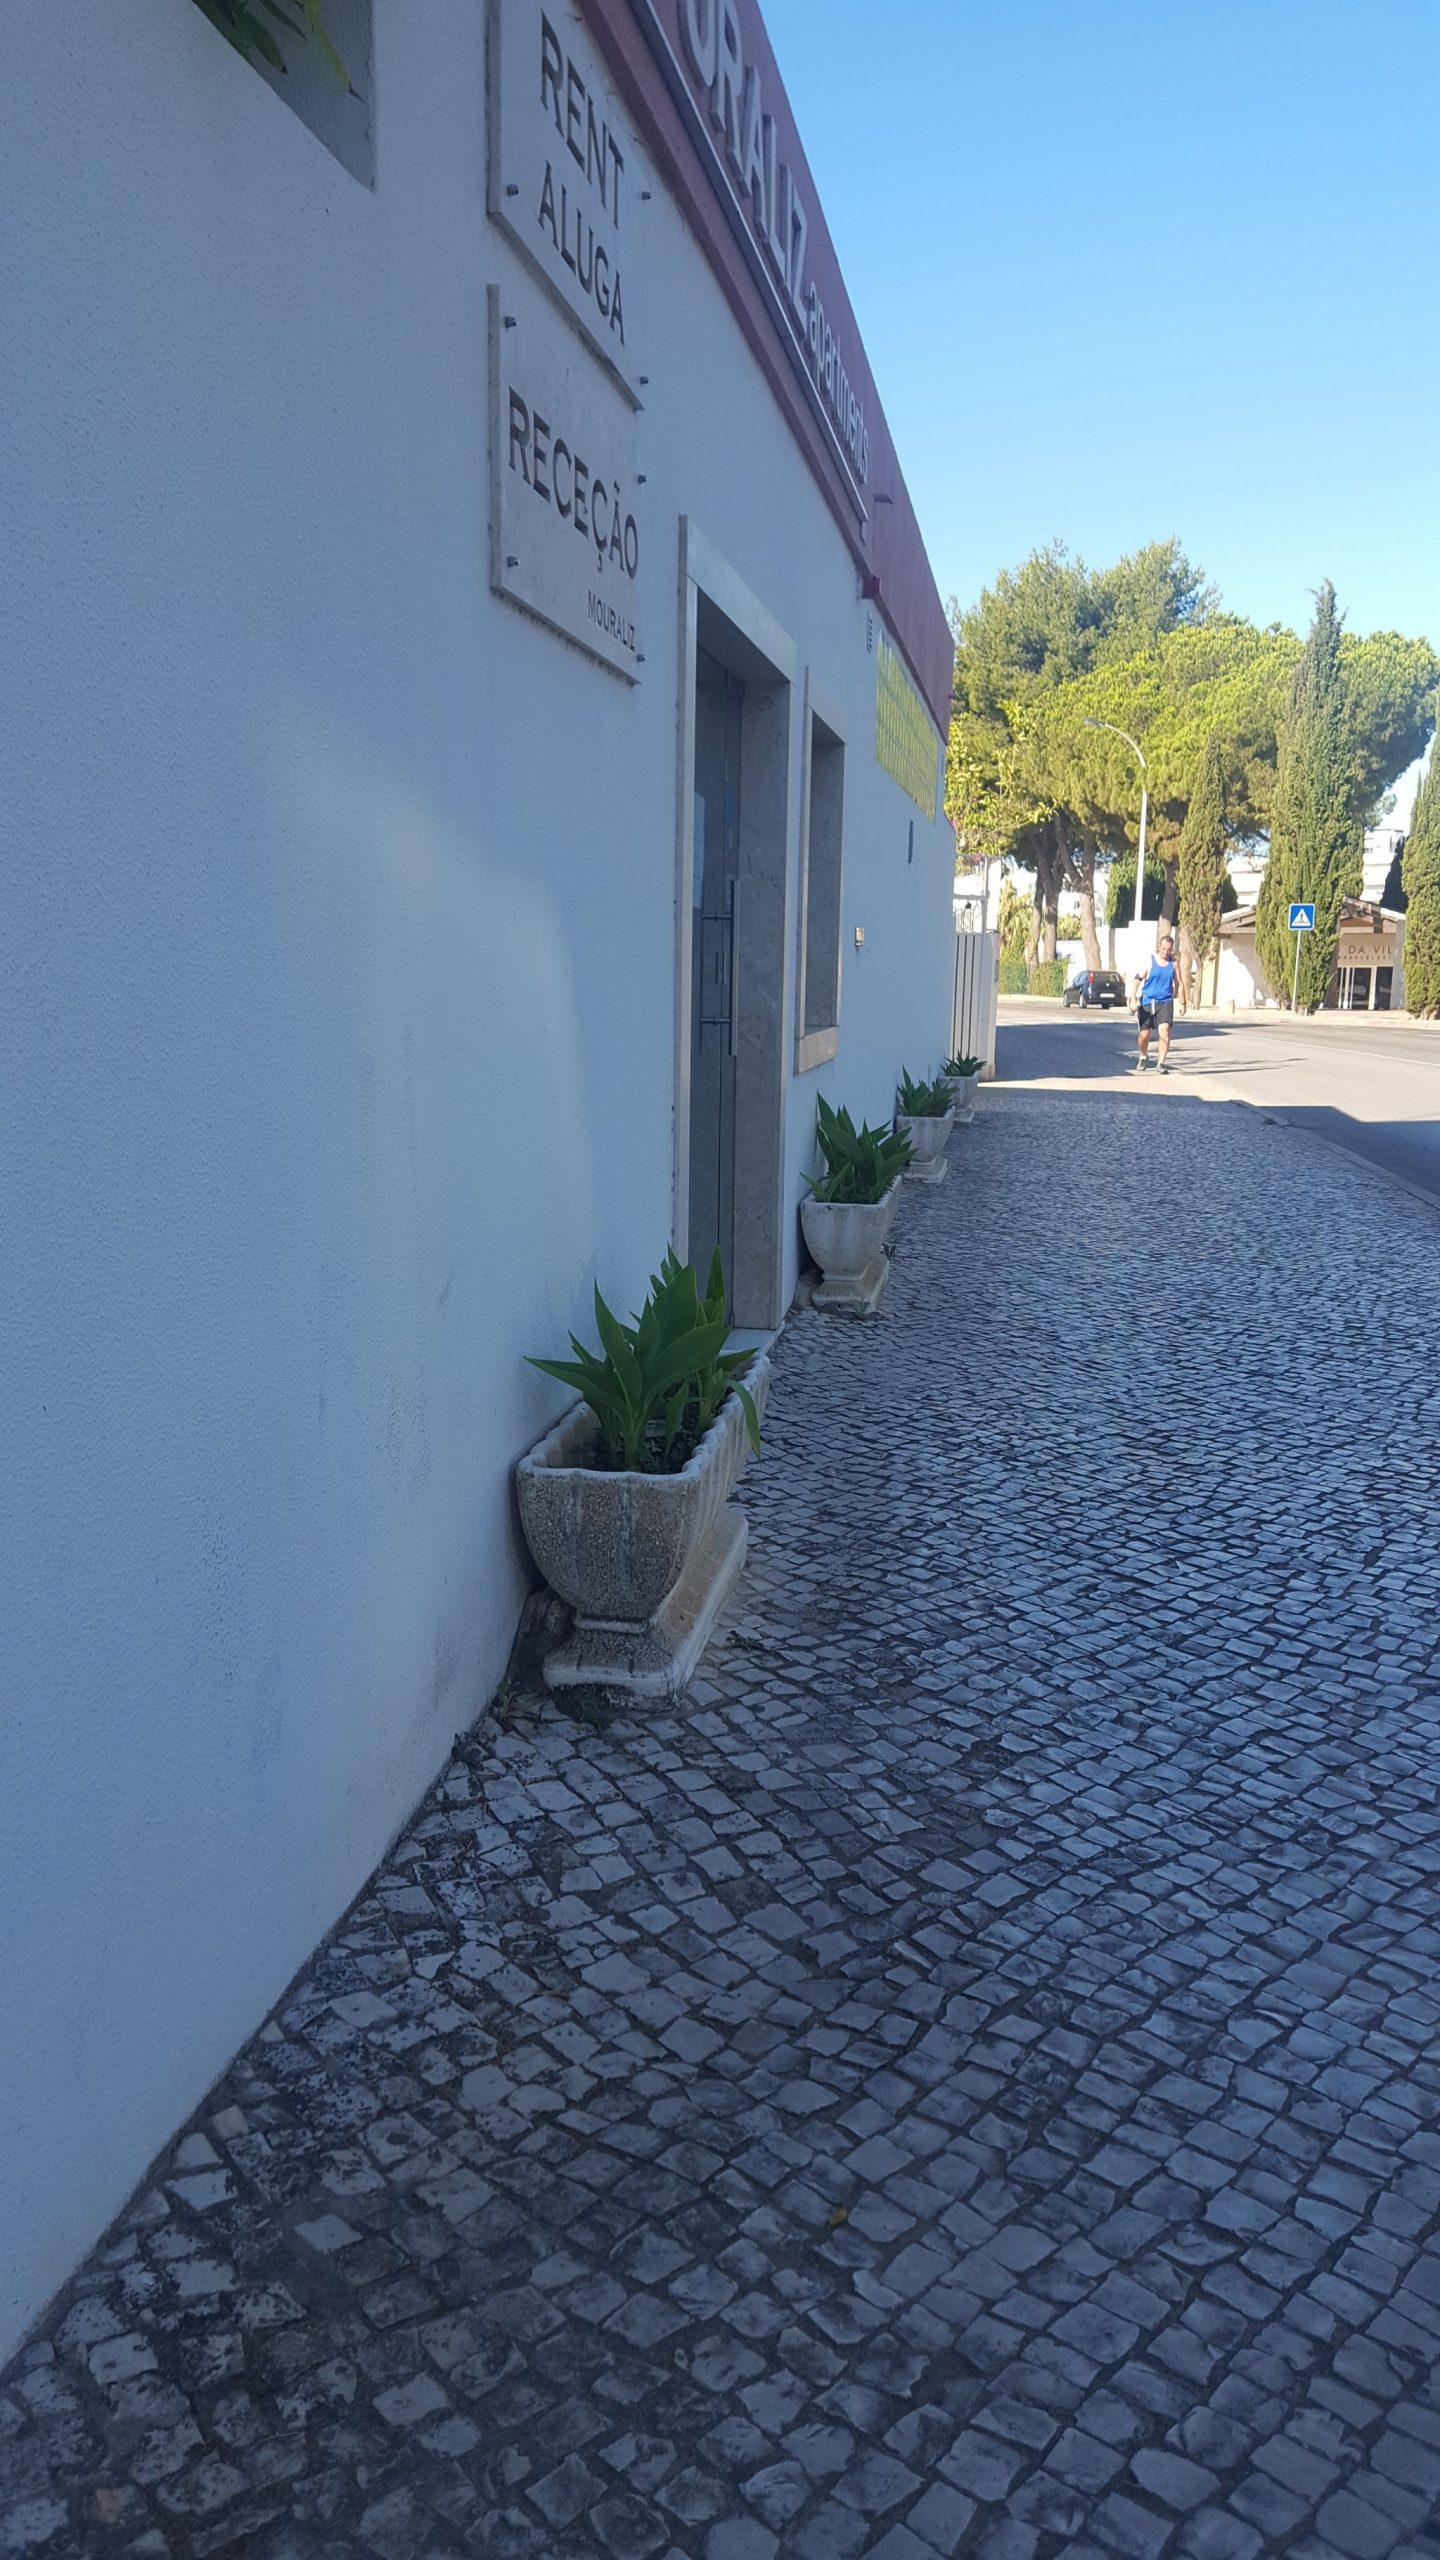 20170803 091825 1440x2560 - My Travel Diaries: I Left My Heart In Vilamoura